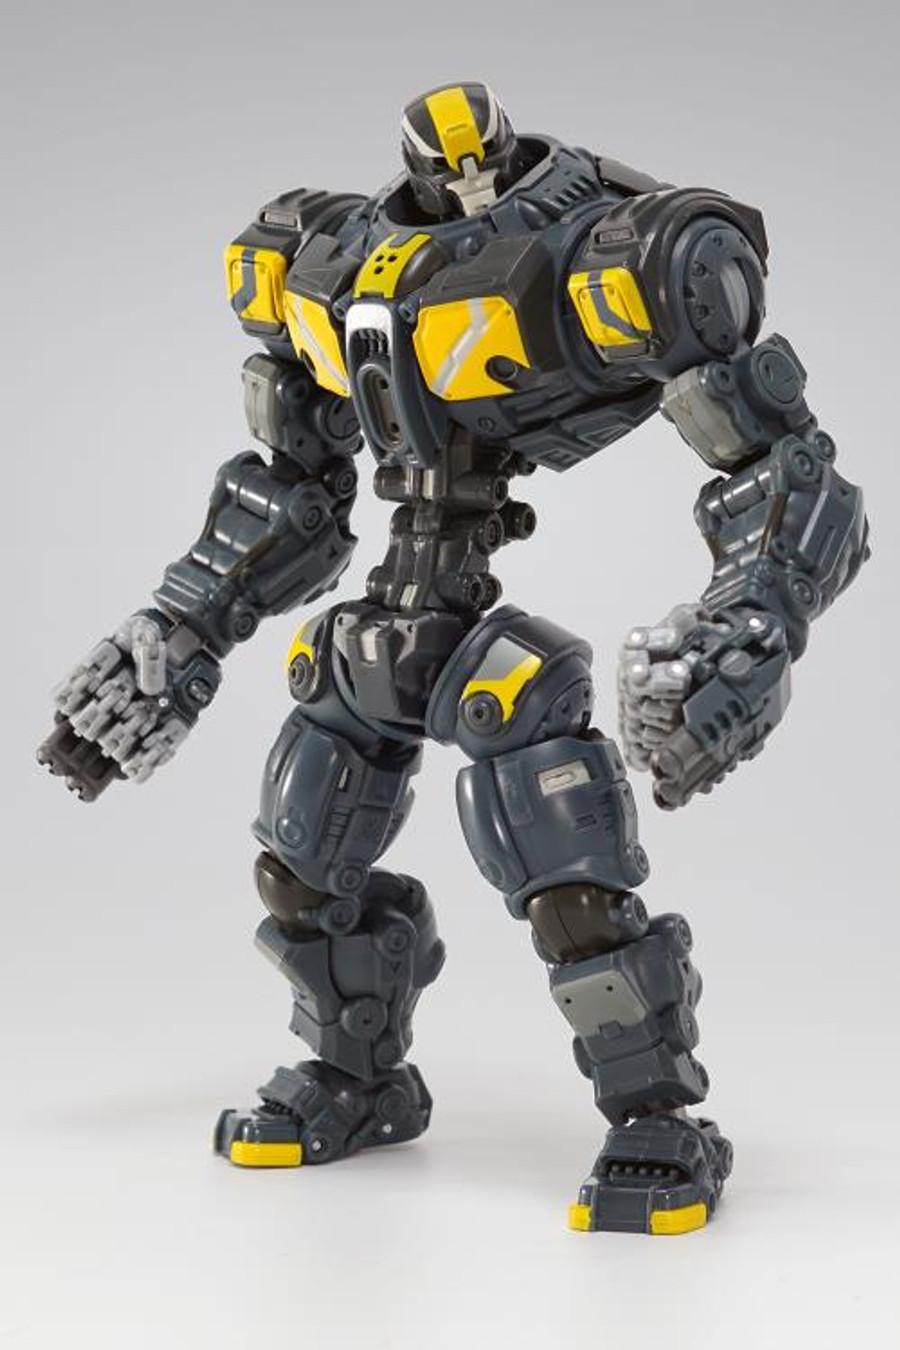 Toy Notch - Astrobots A02 Argus (Reissue)